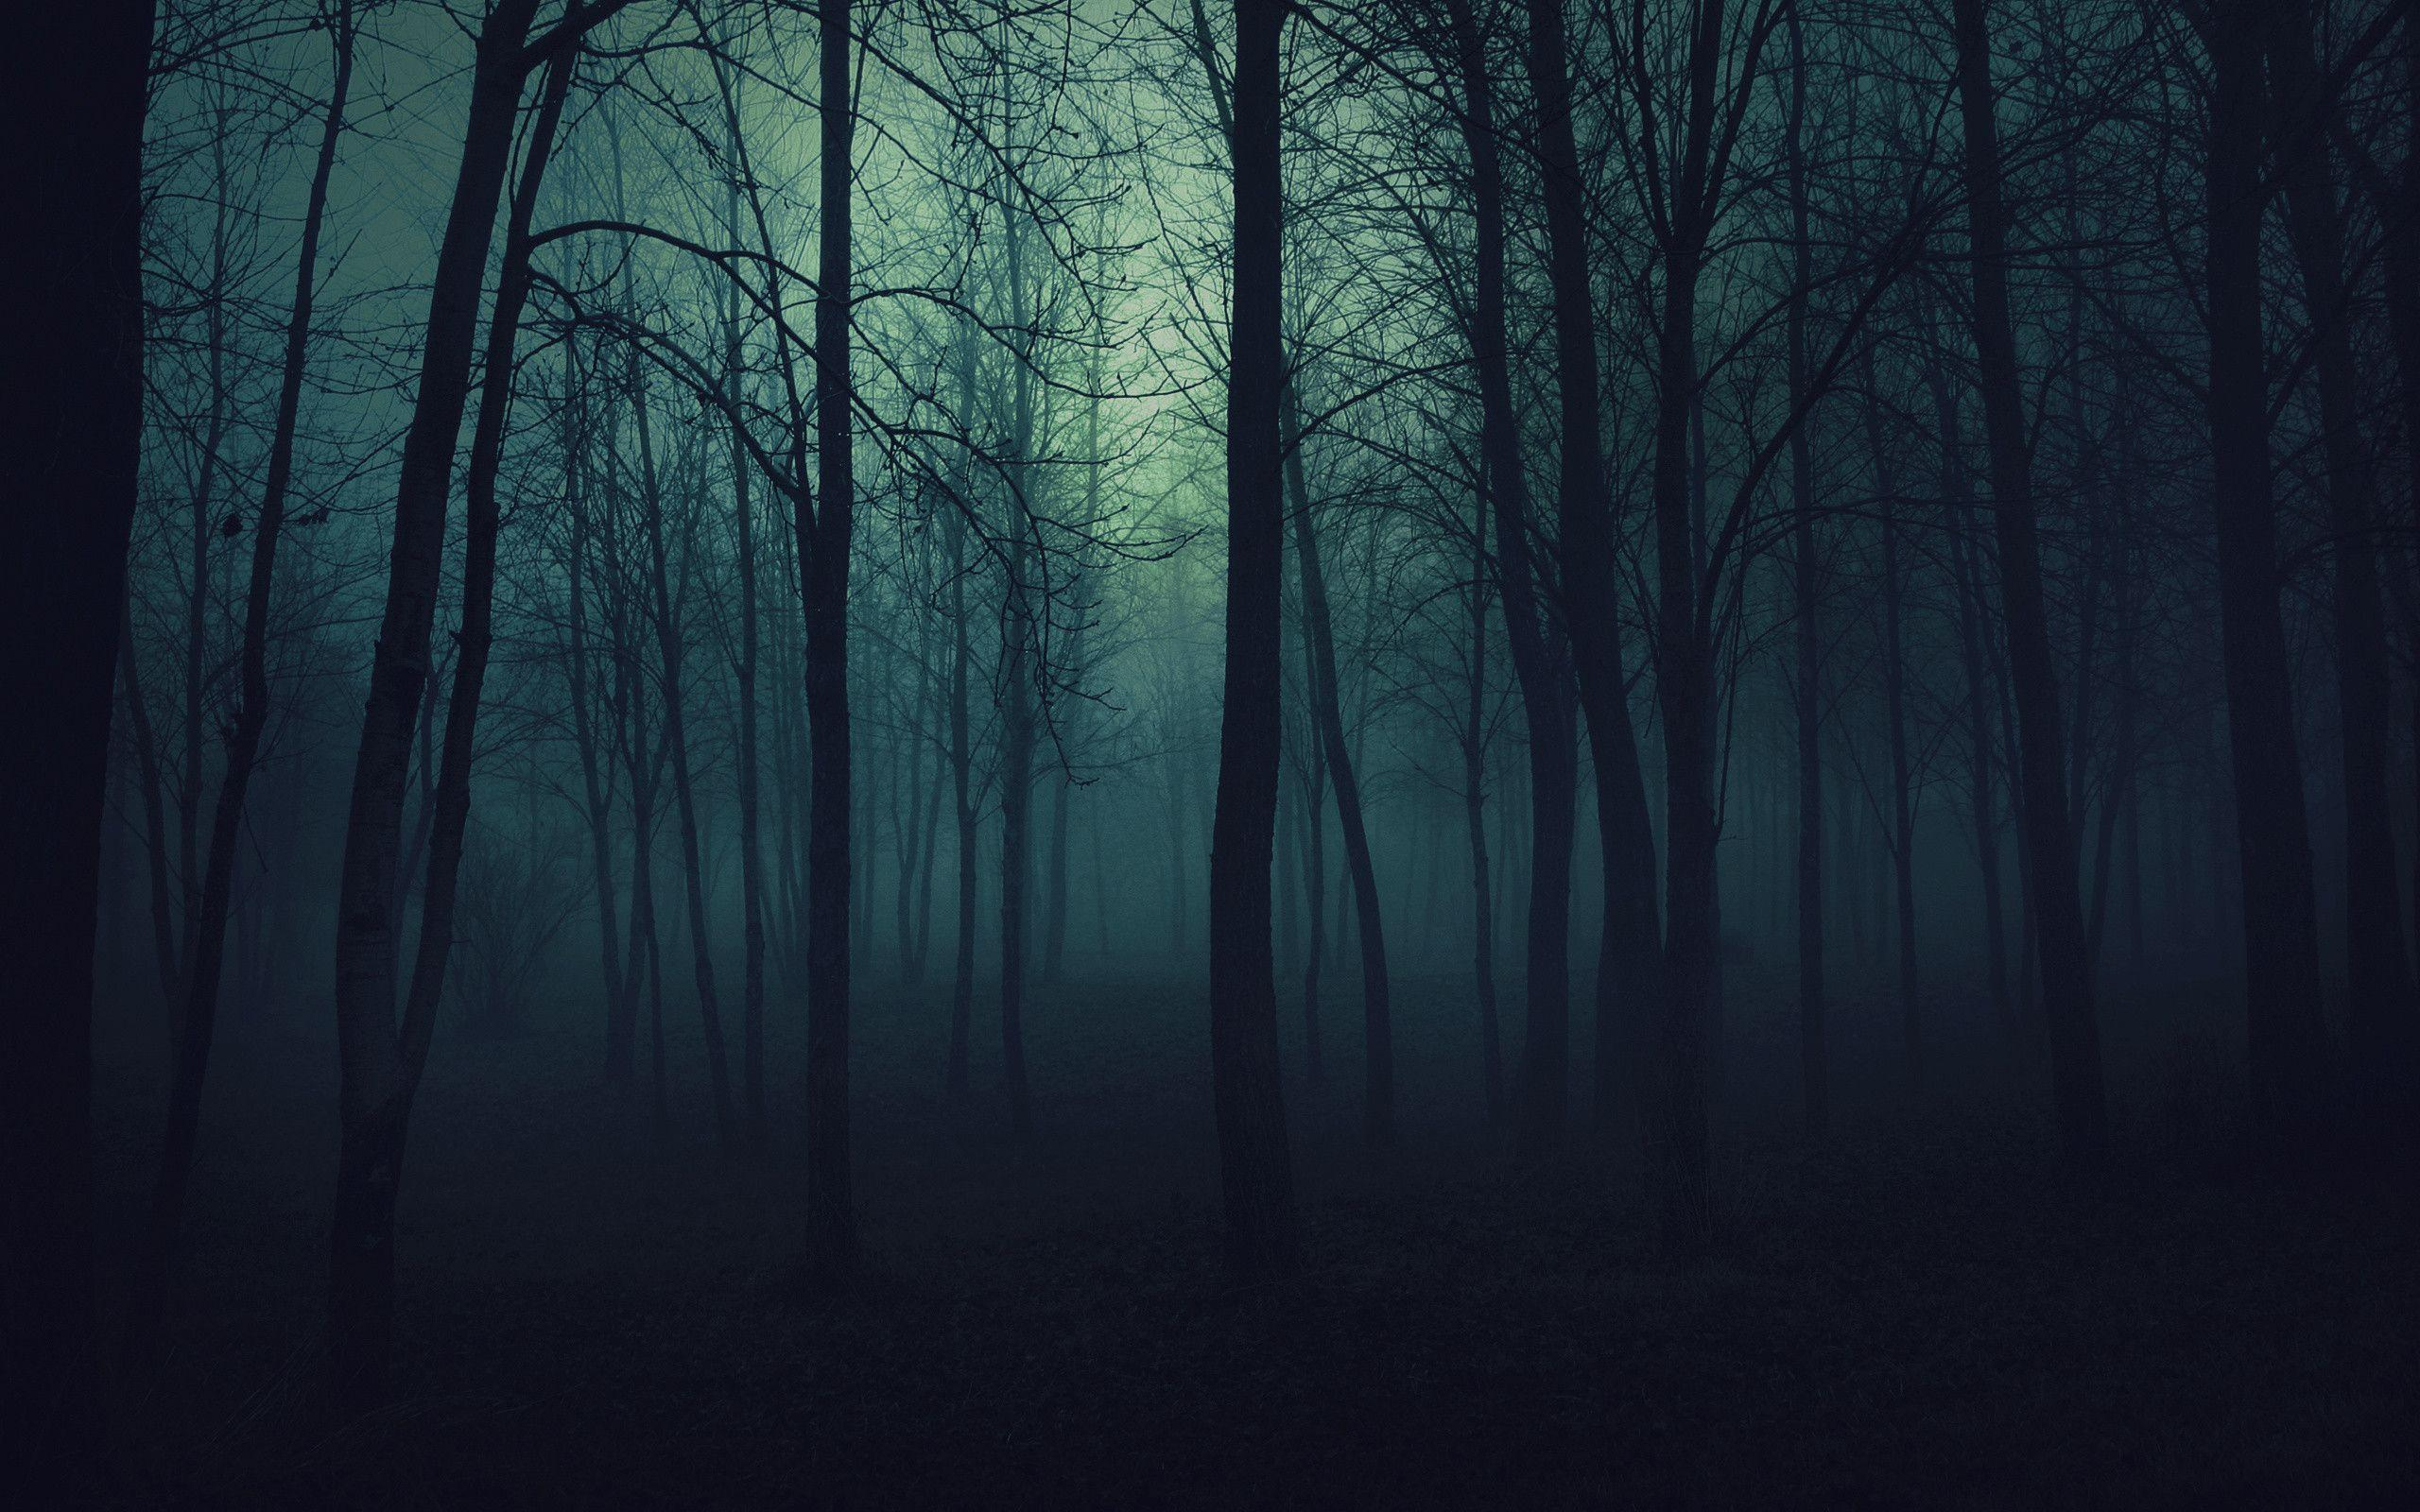 Images For Dark Woods Wallpaper Hd